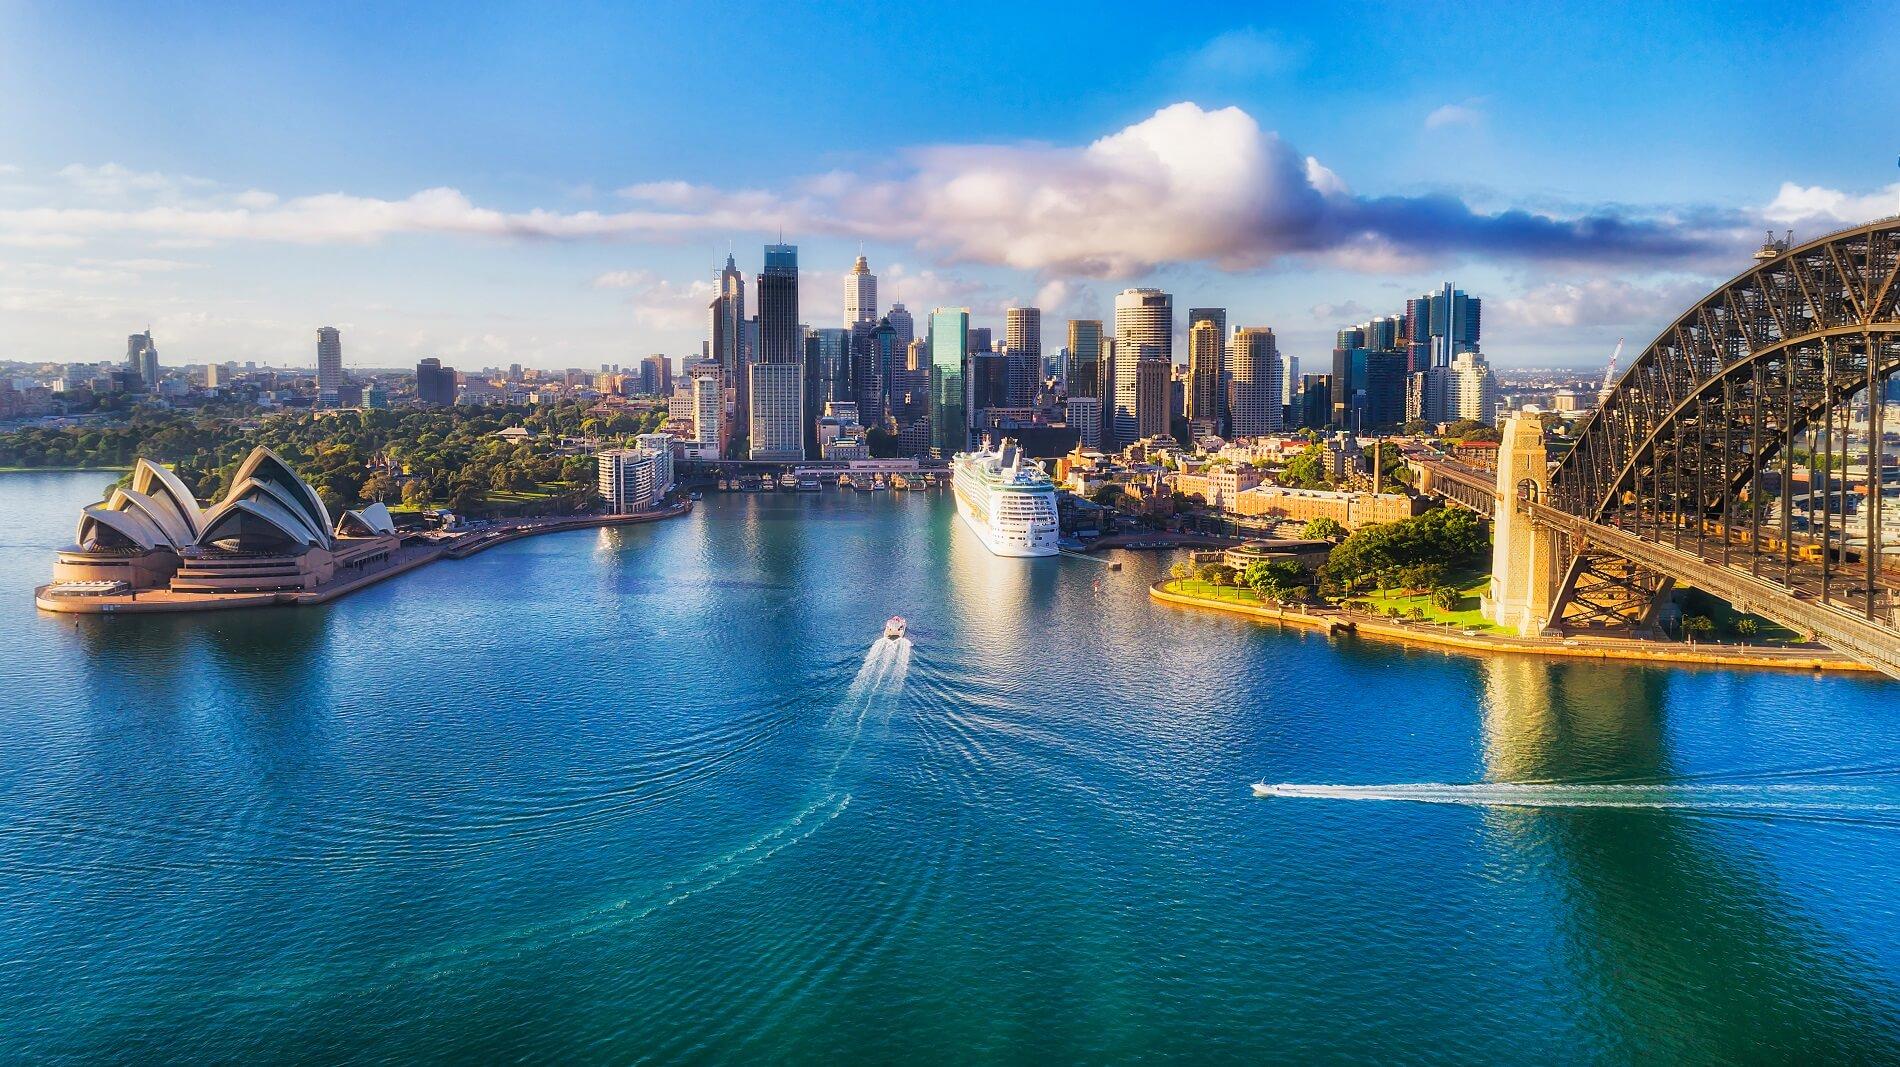 trasloco in australia